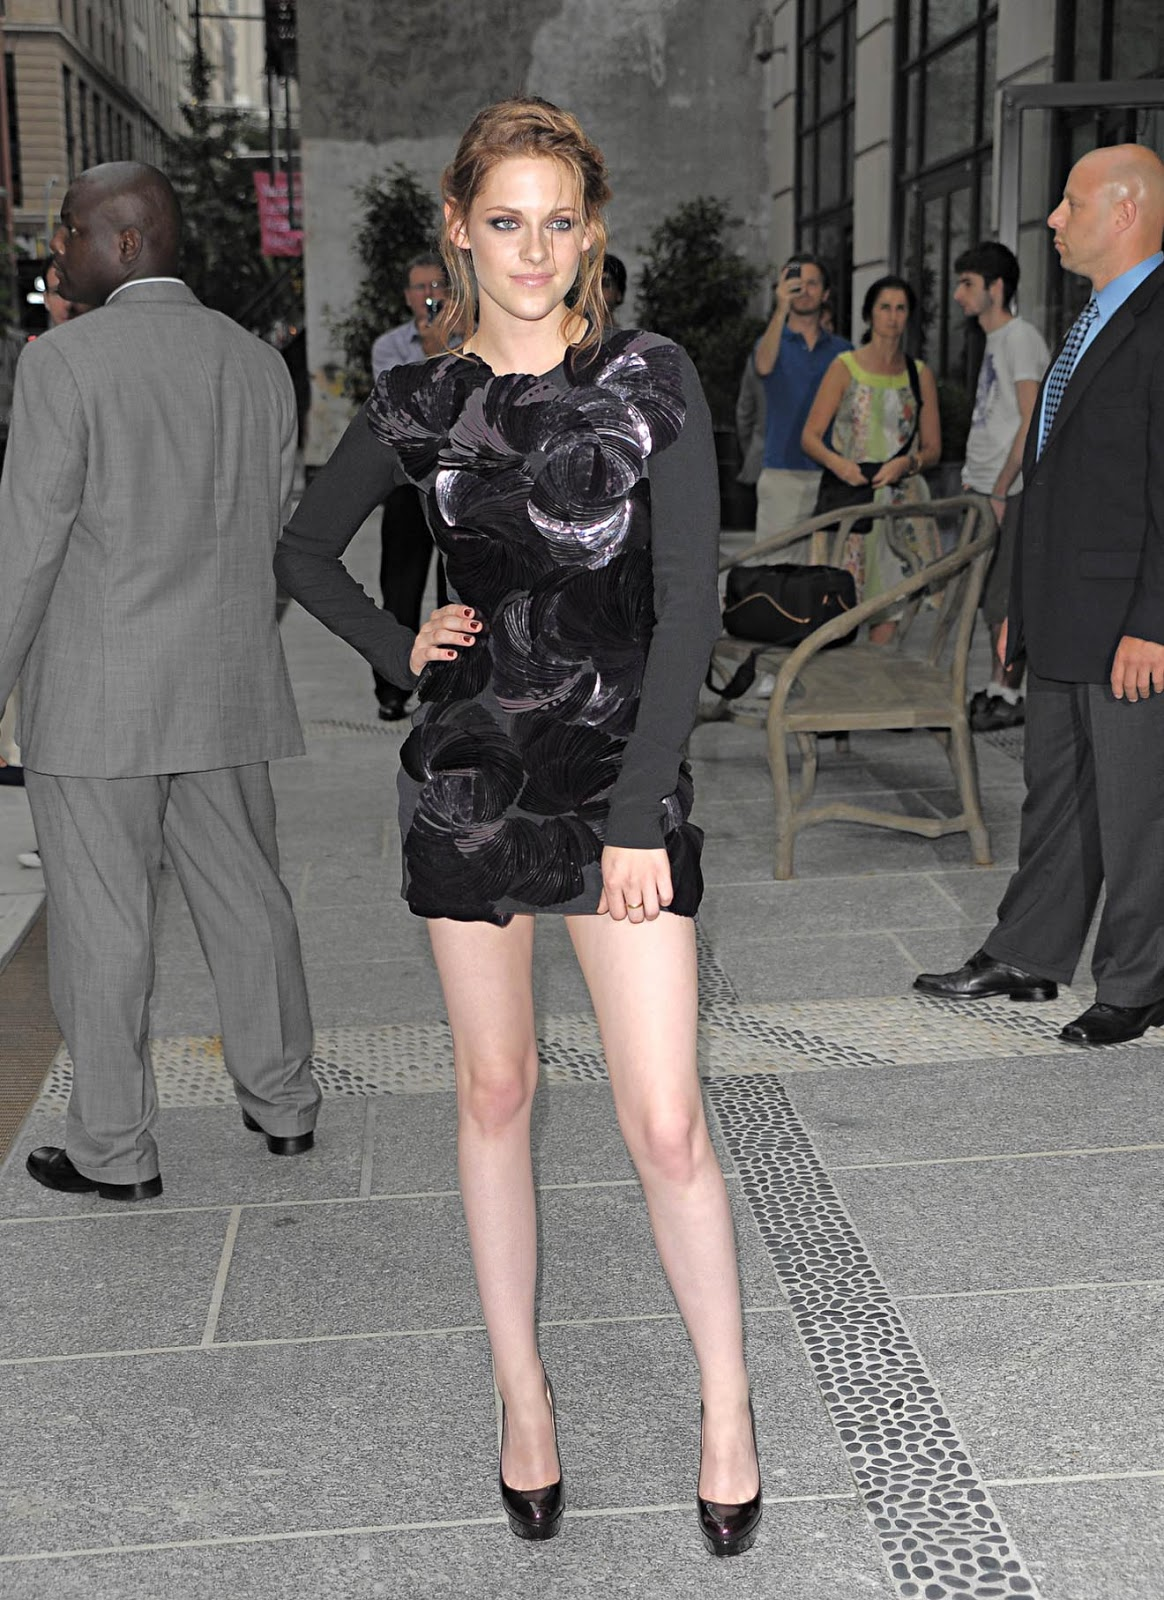 Hd Wallpapers Fine Kristen Stewart Hot,Kristen Stewart